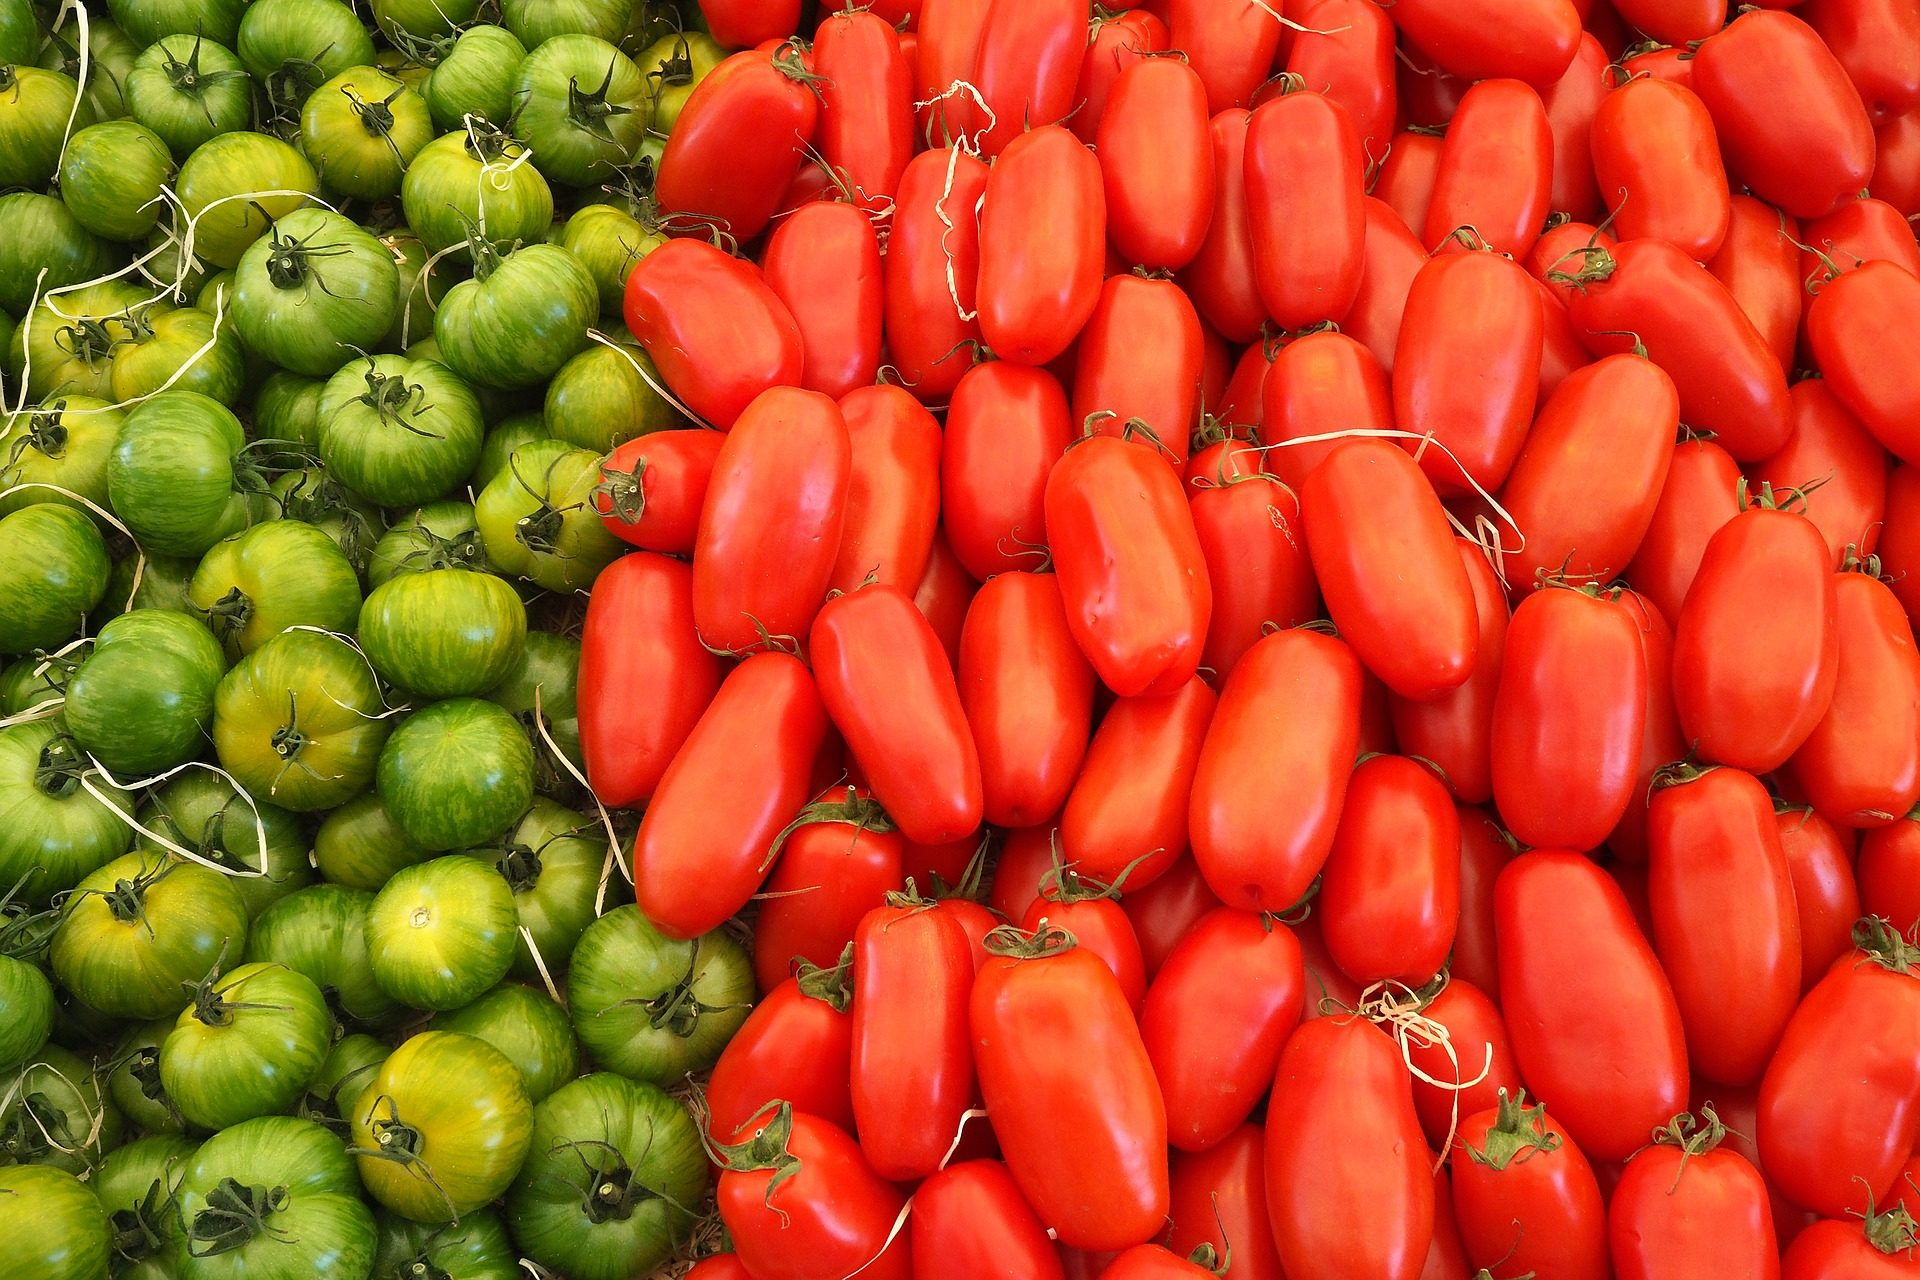 verduras, トマト, 赤, グリ�野菜etales - HD の壁紙 - 教授-falken.com